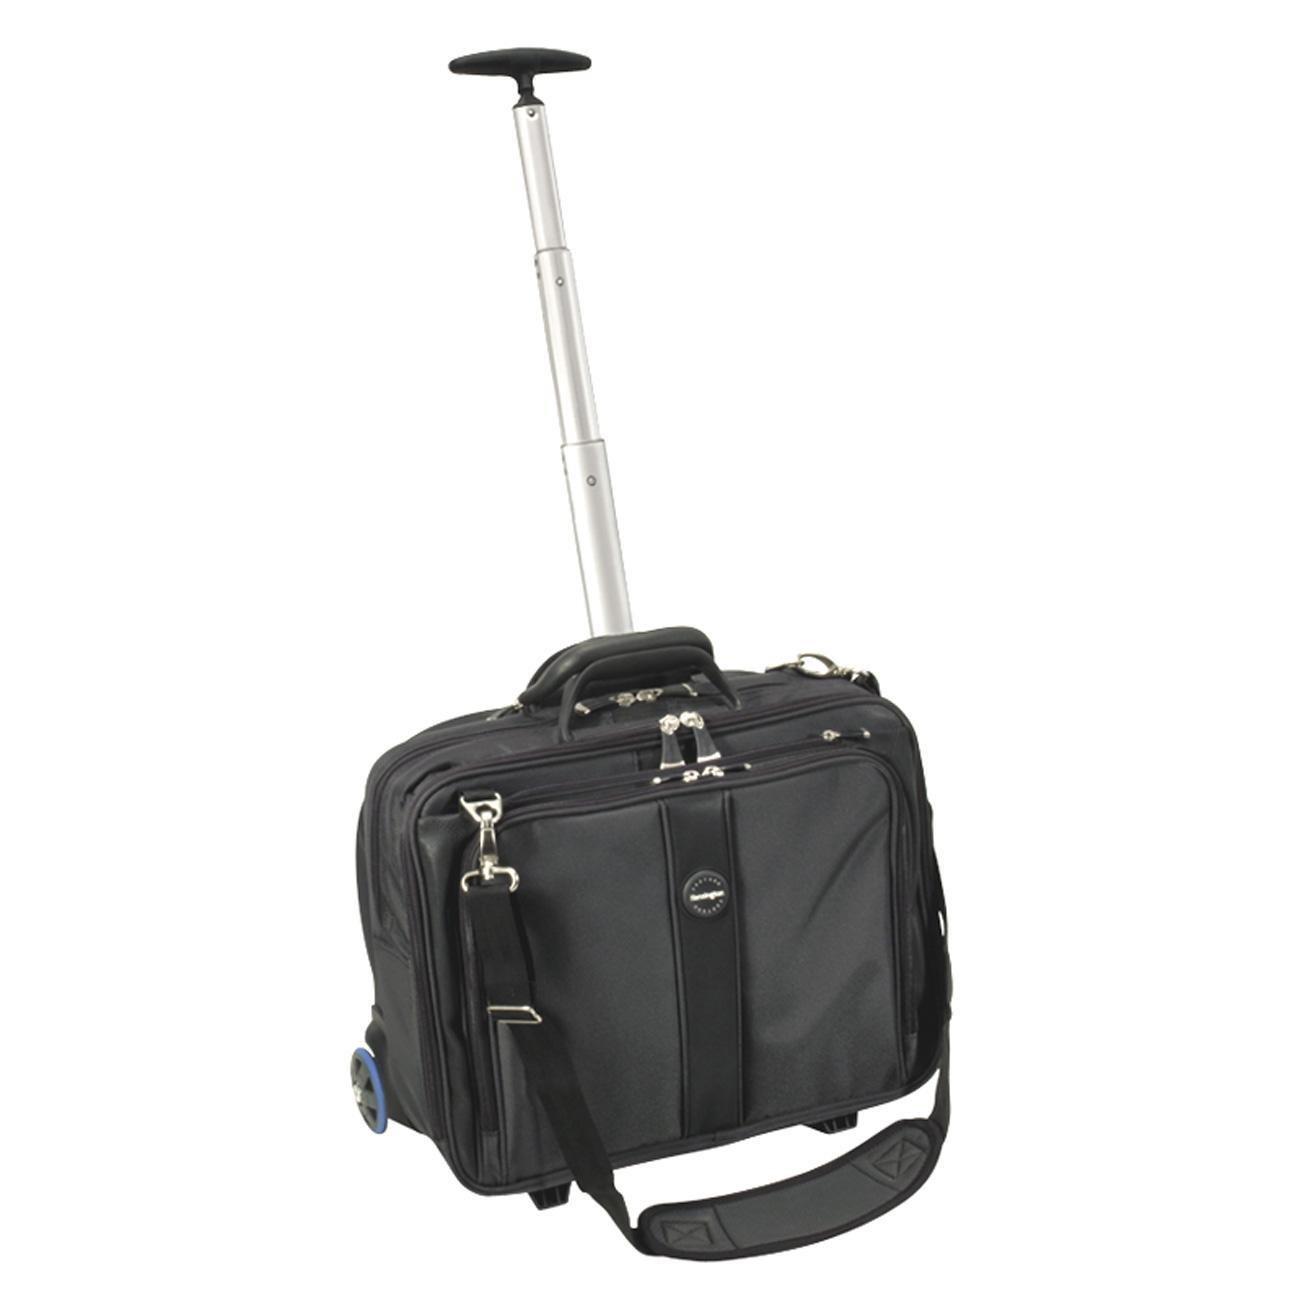 "Kensington Contour Carrying Case (Roller) for 43.2 cm (17"") Notebook - Grey"